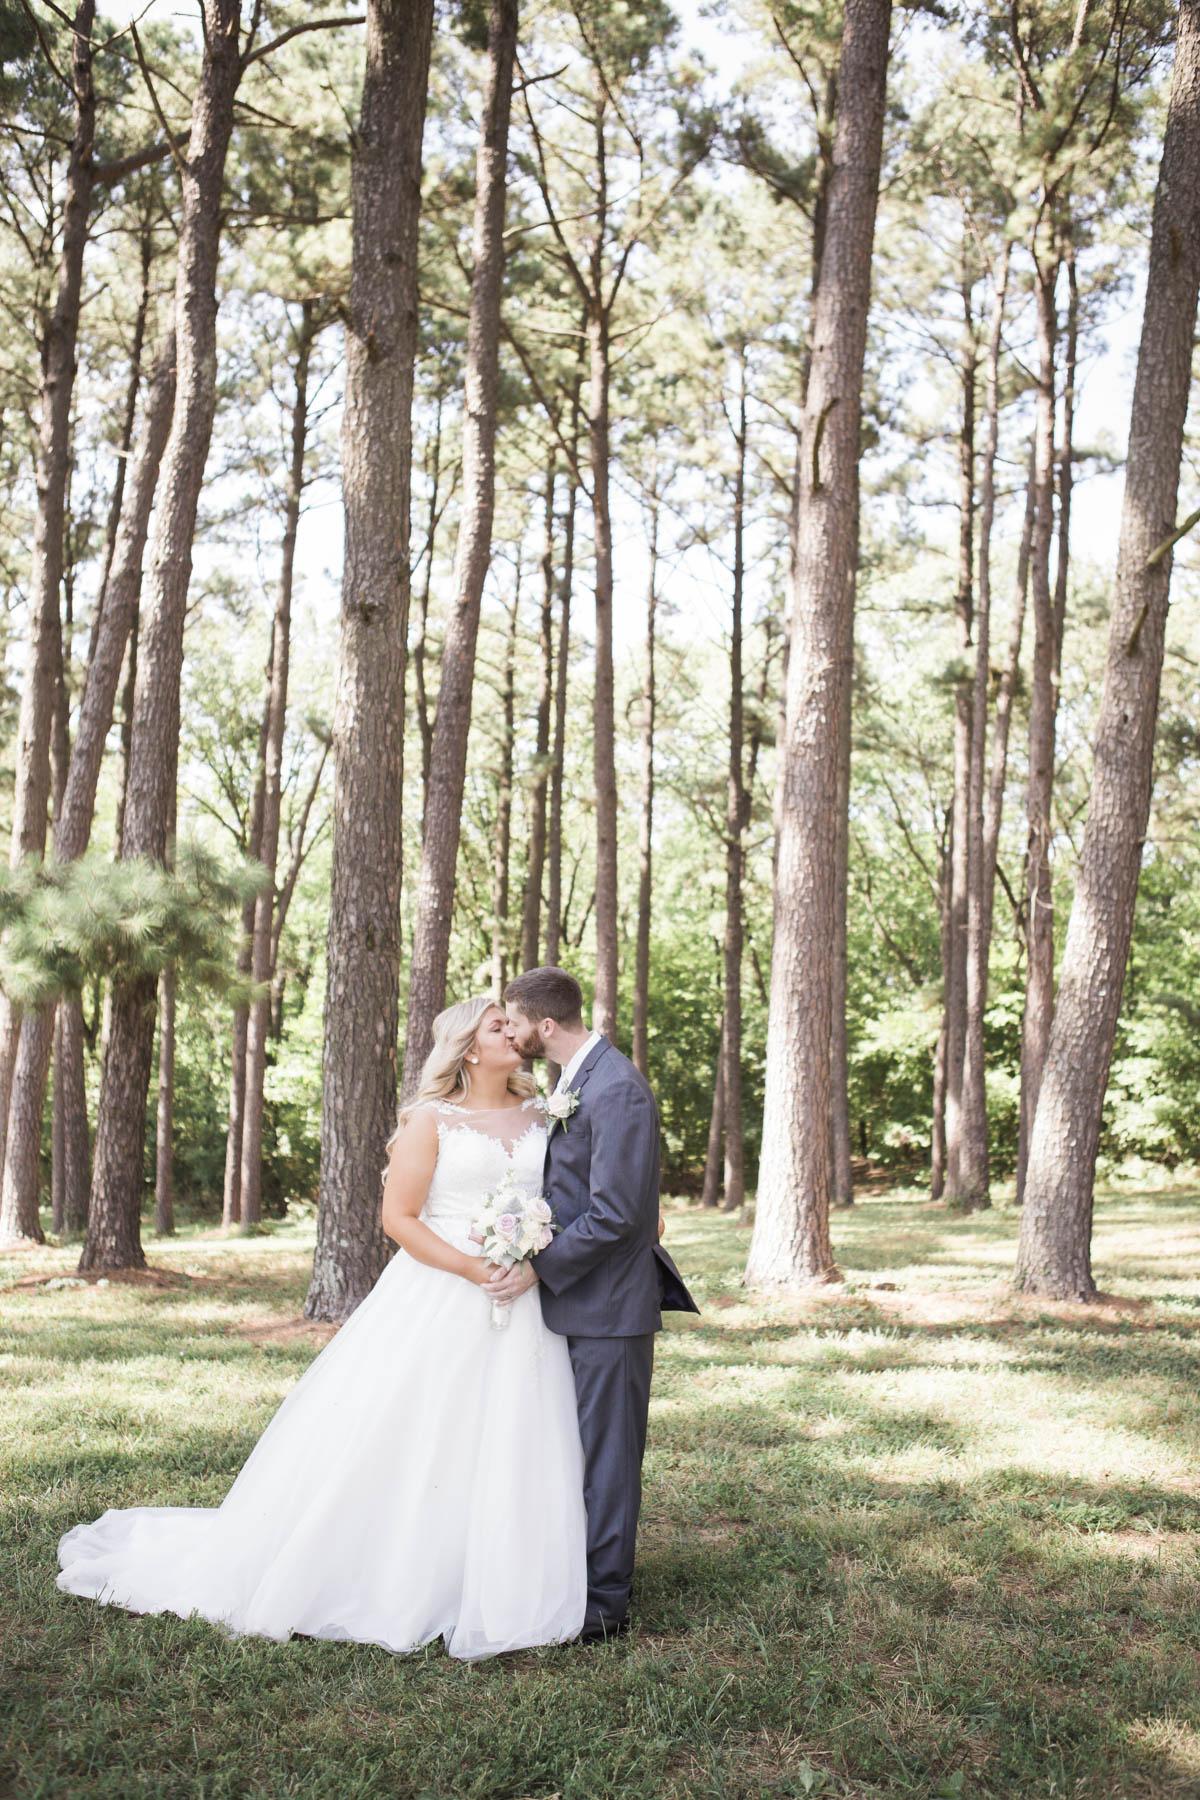 shotbychelsea_wedding_photography_blog-9.jpg